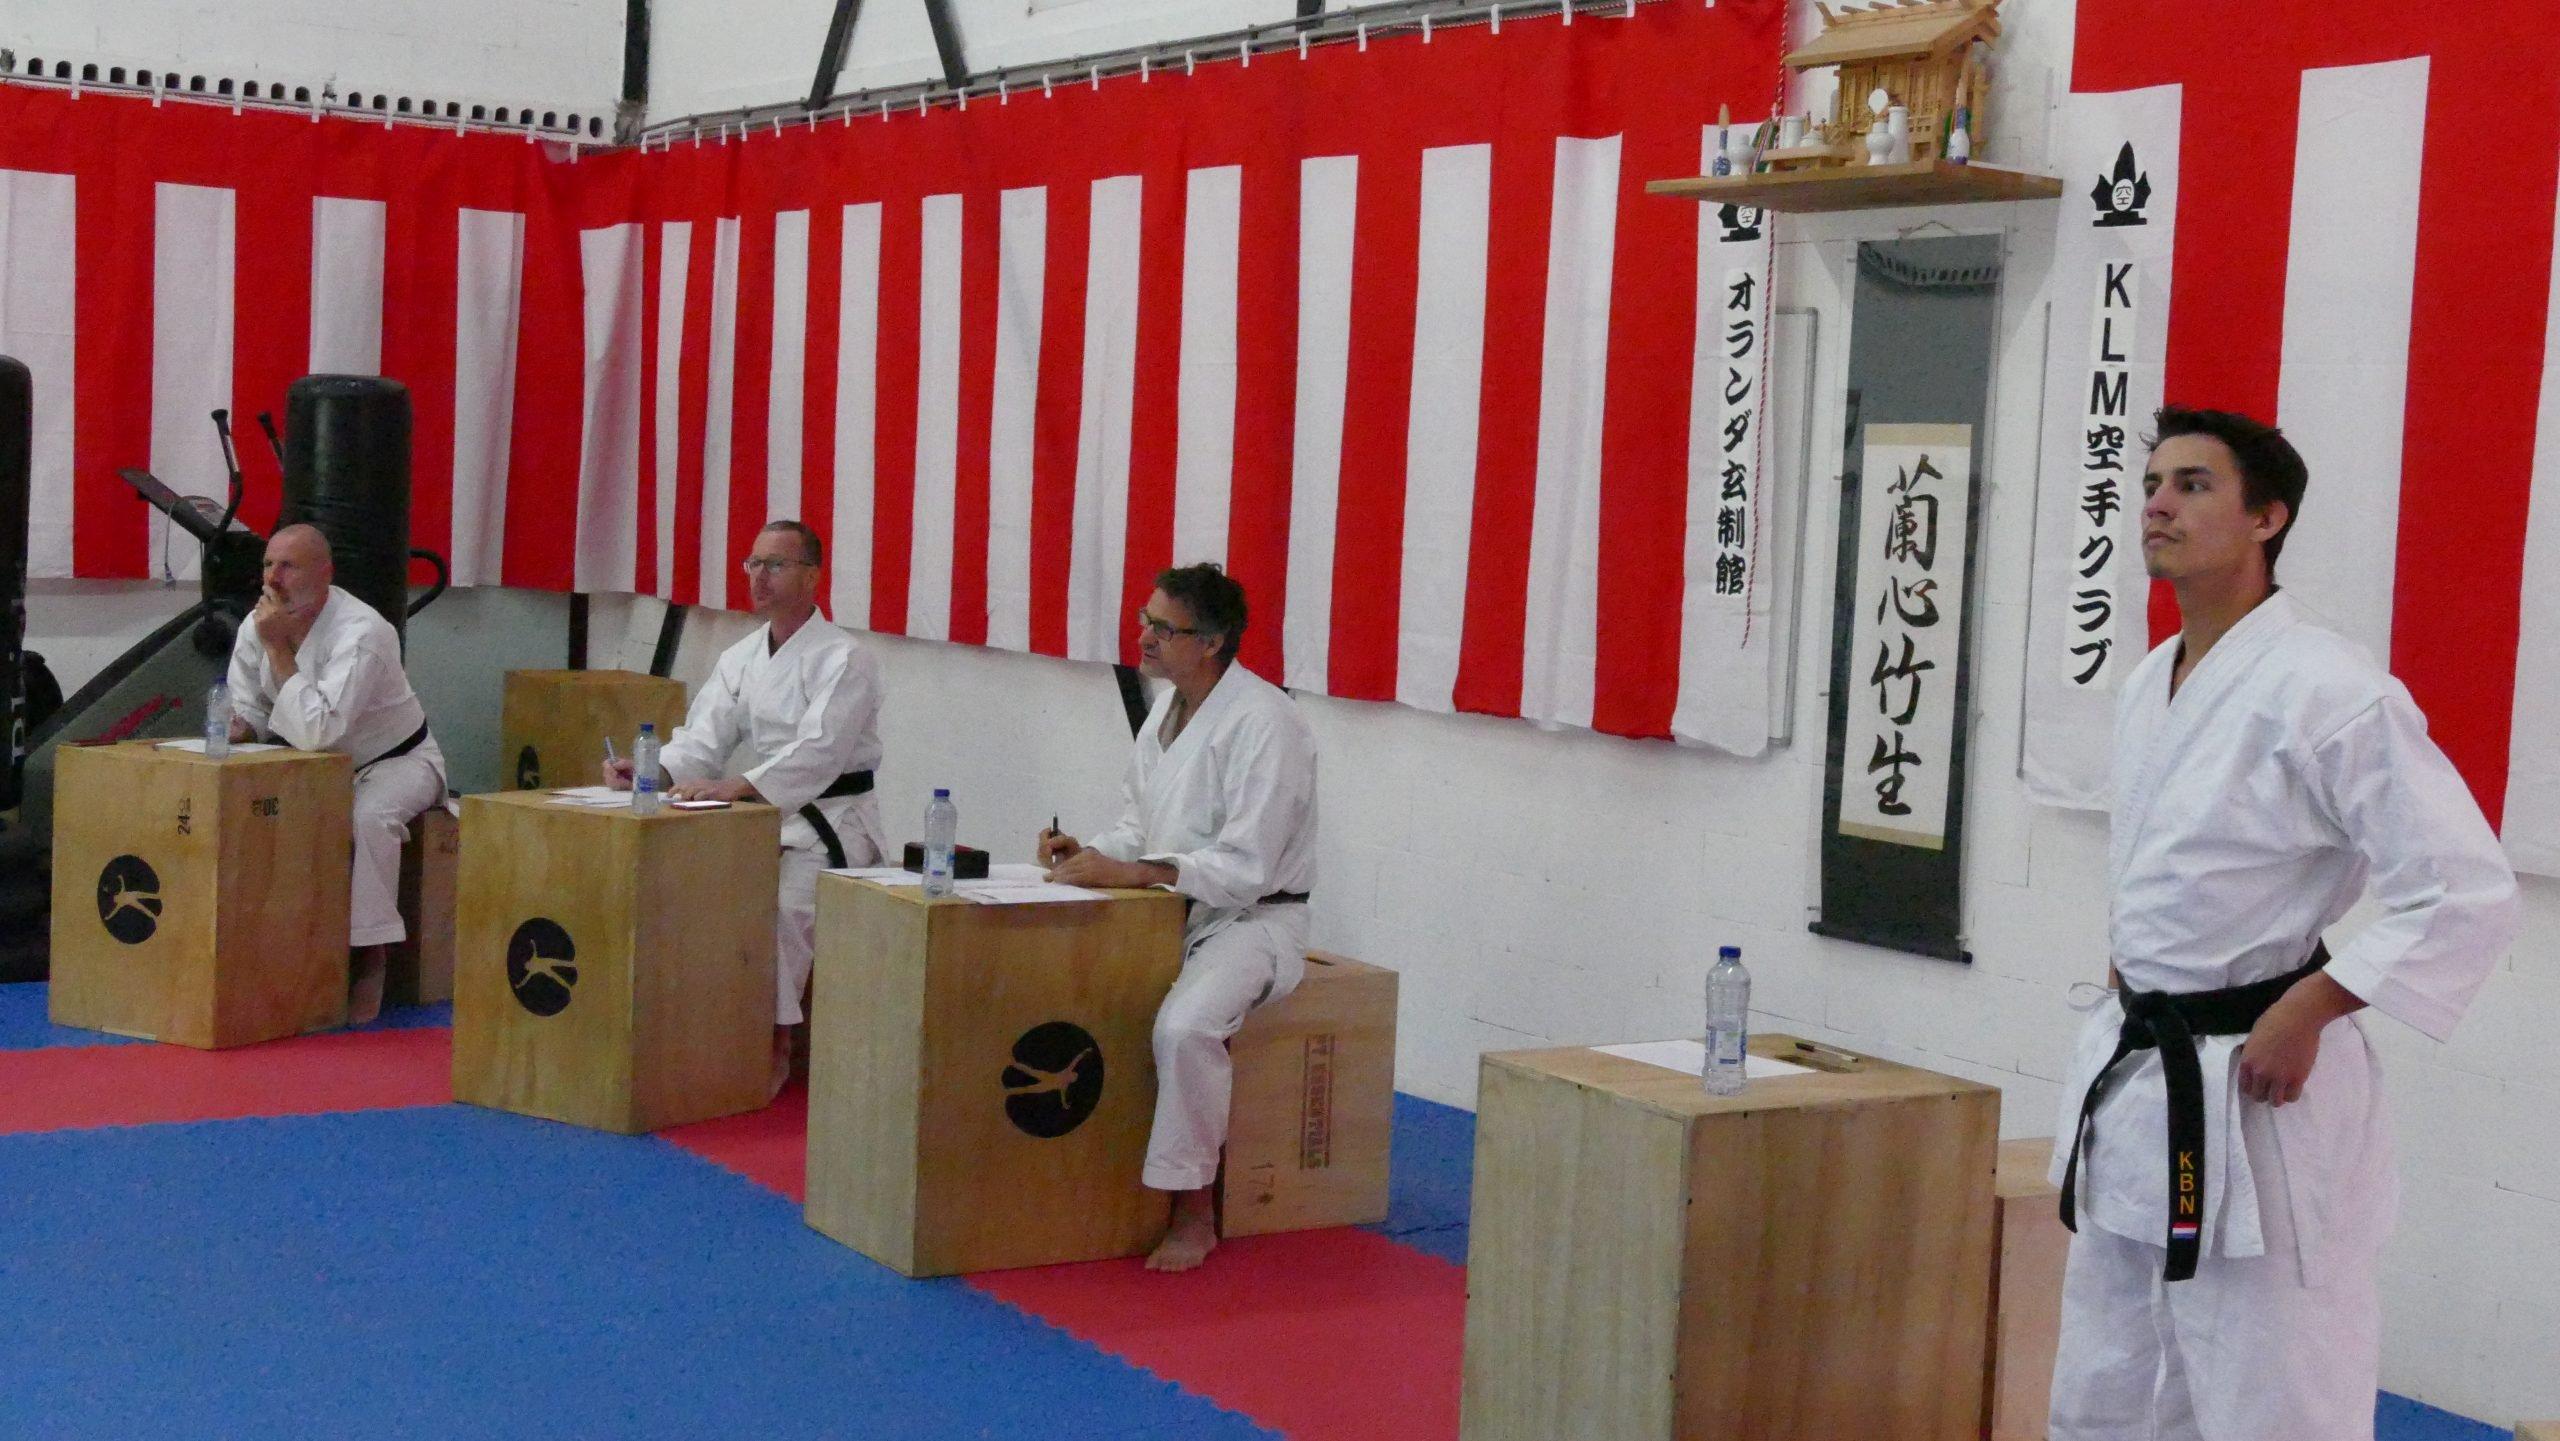 Kyu examen Anna Paulowna Bonsai / wit September 2020